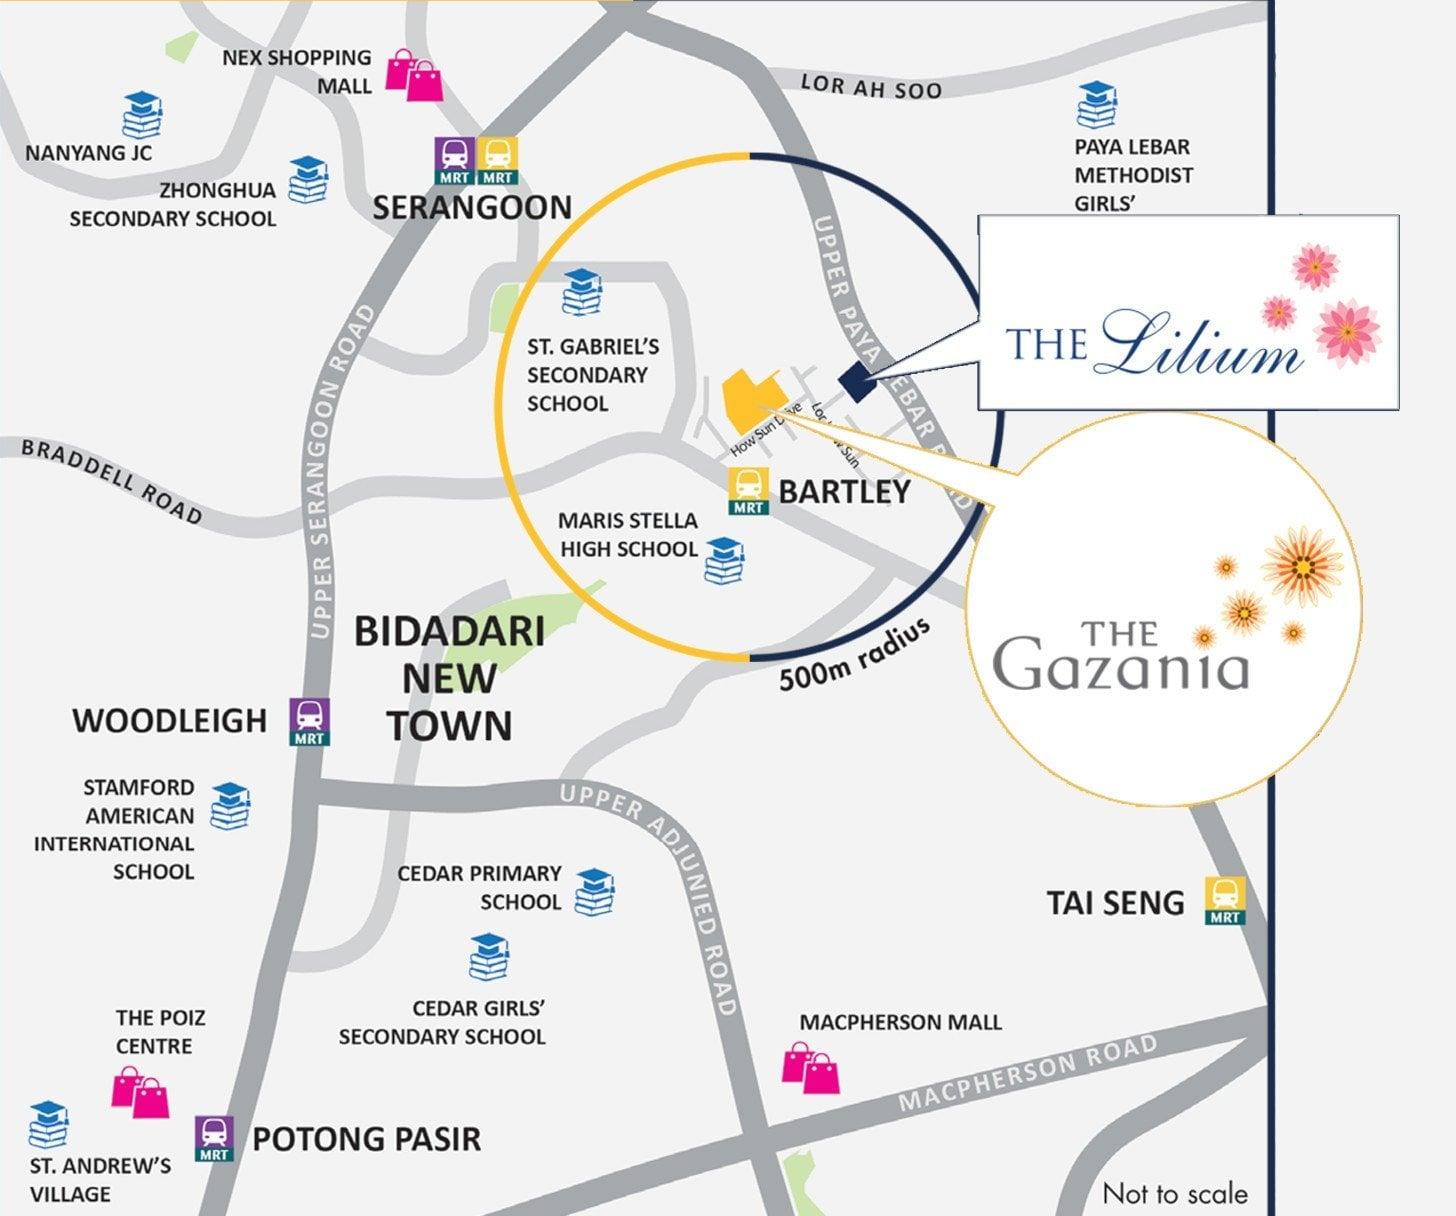 The-Lilium-Gazania-Location-Map